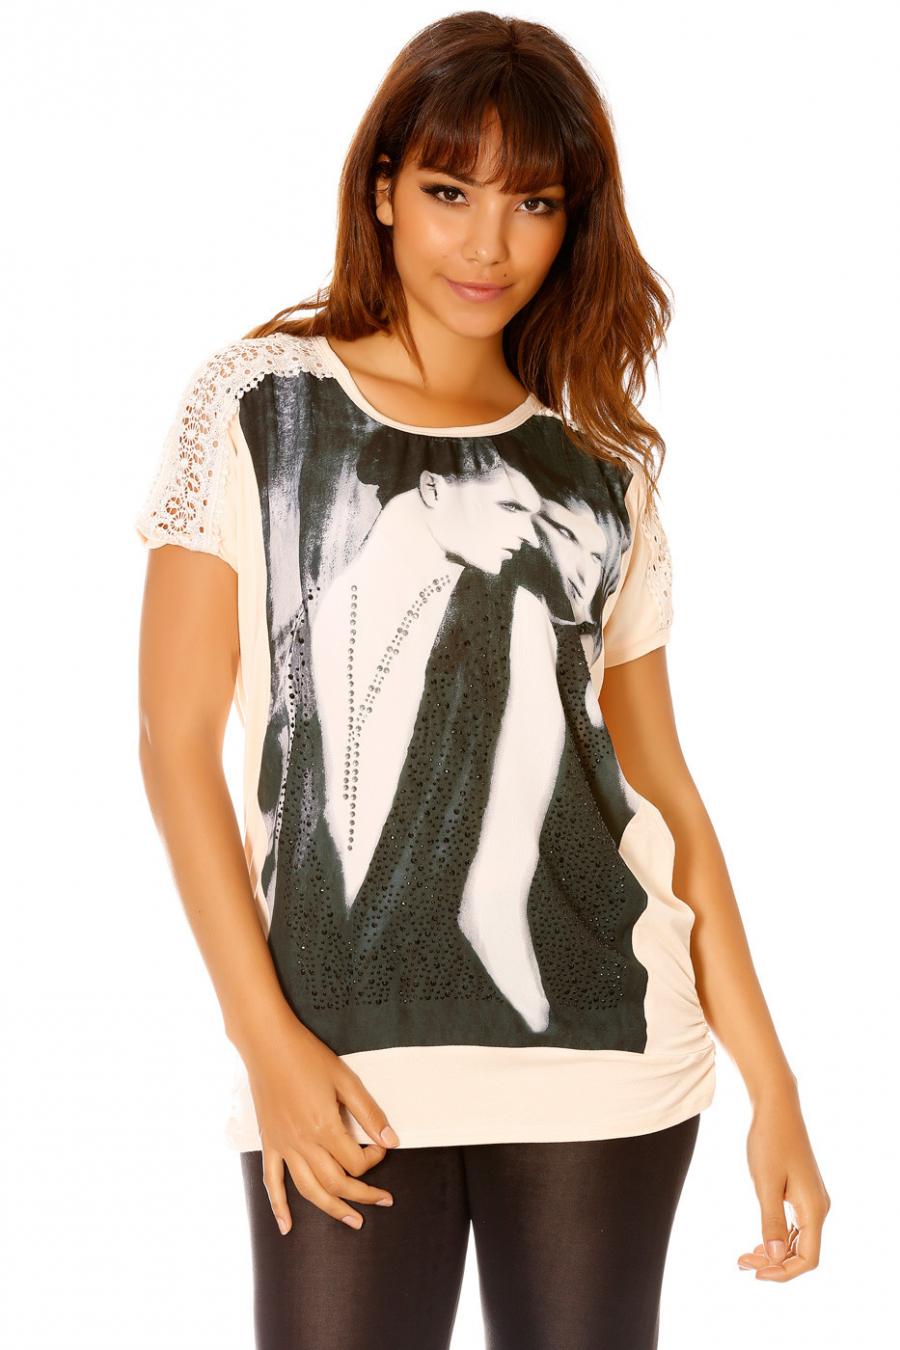 Tee-shirt ample à strass et empiècements dentelle. MC 1713